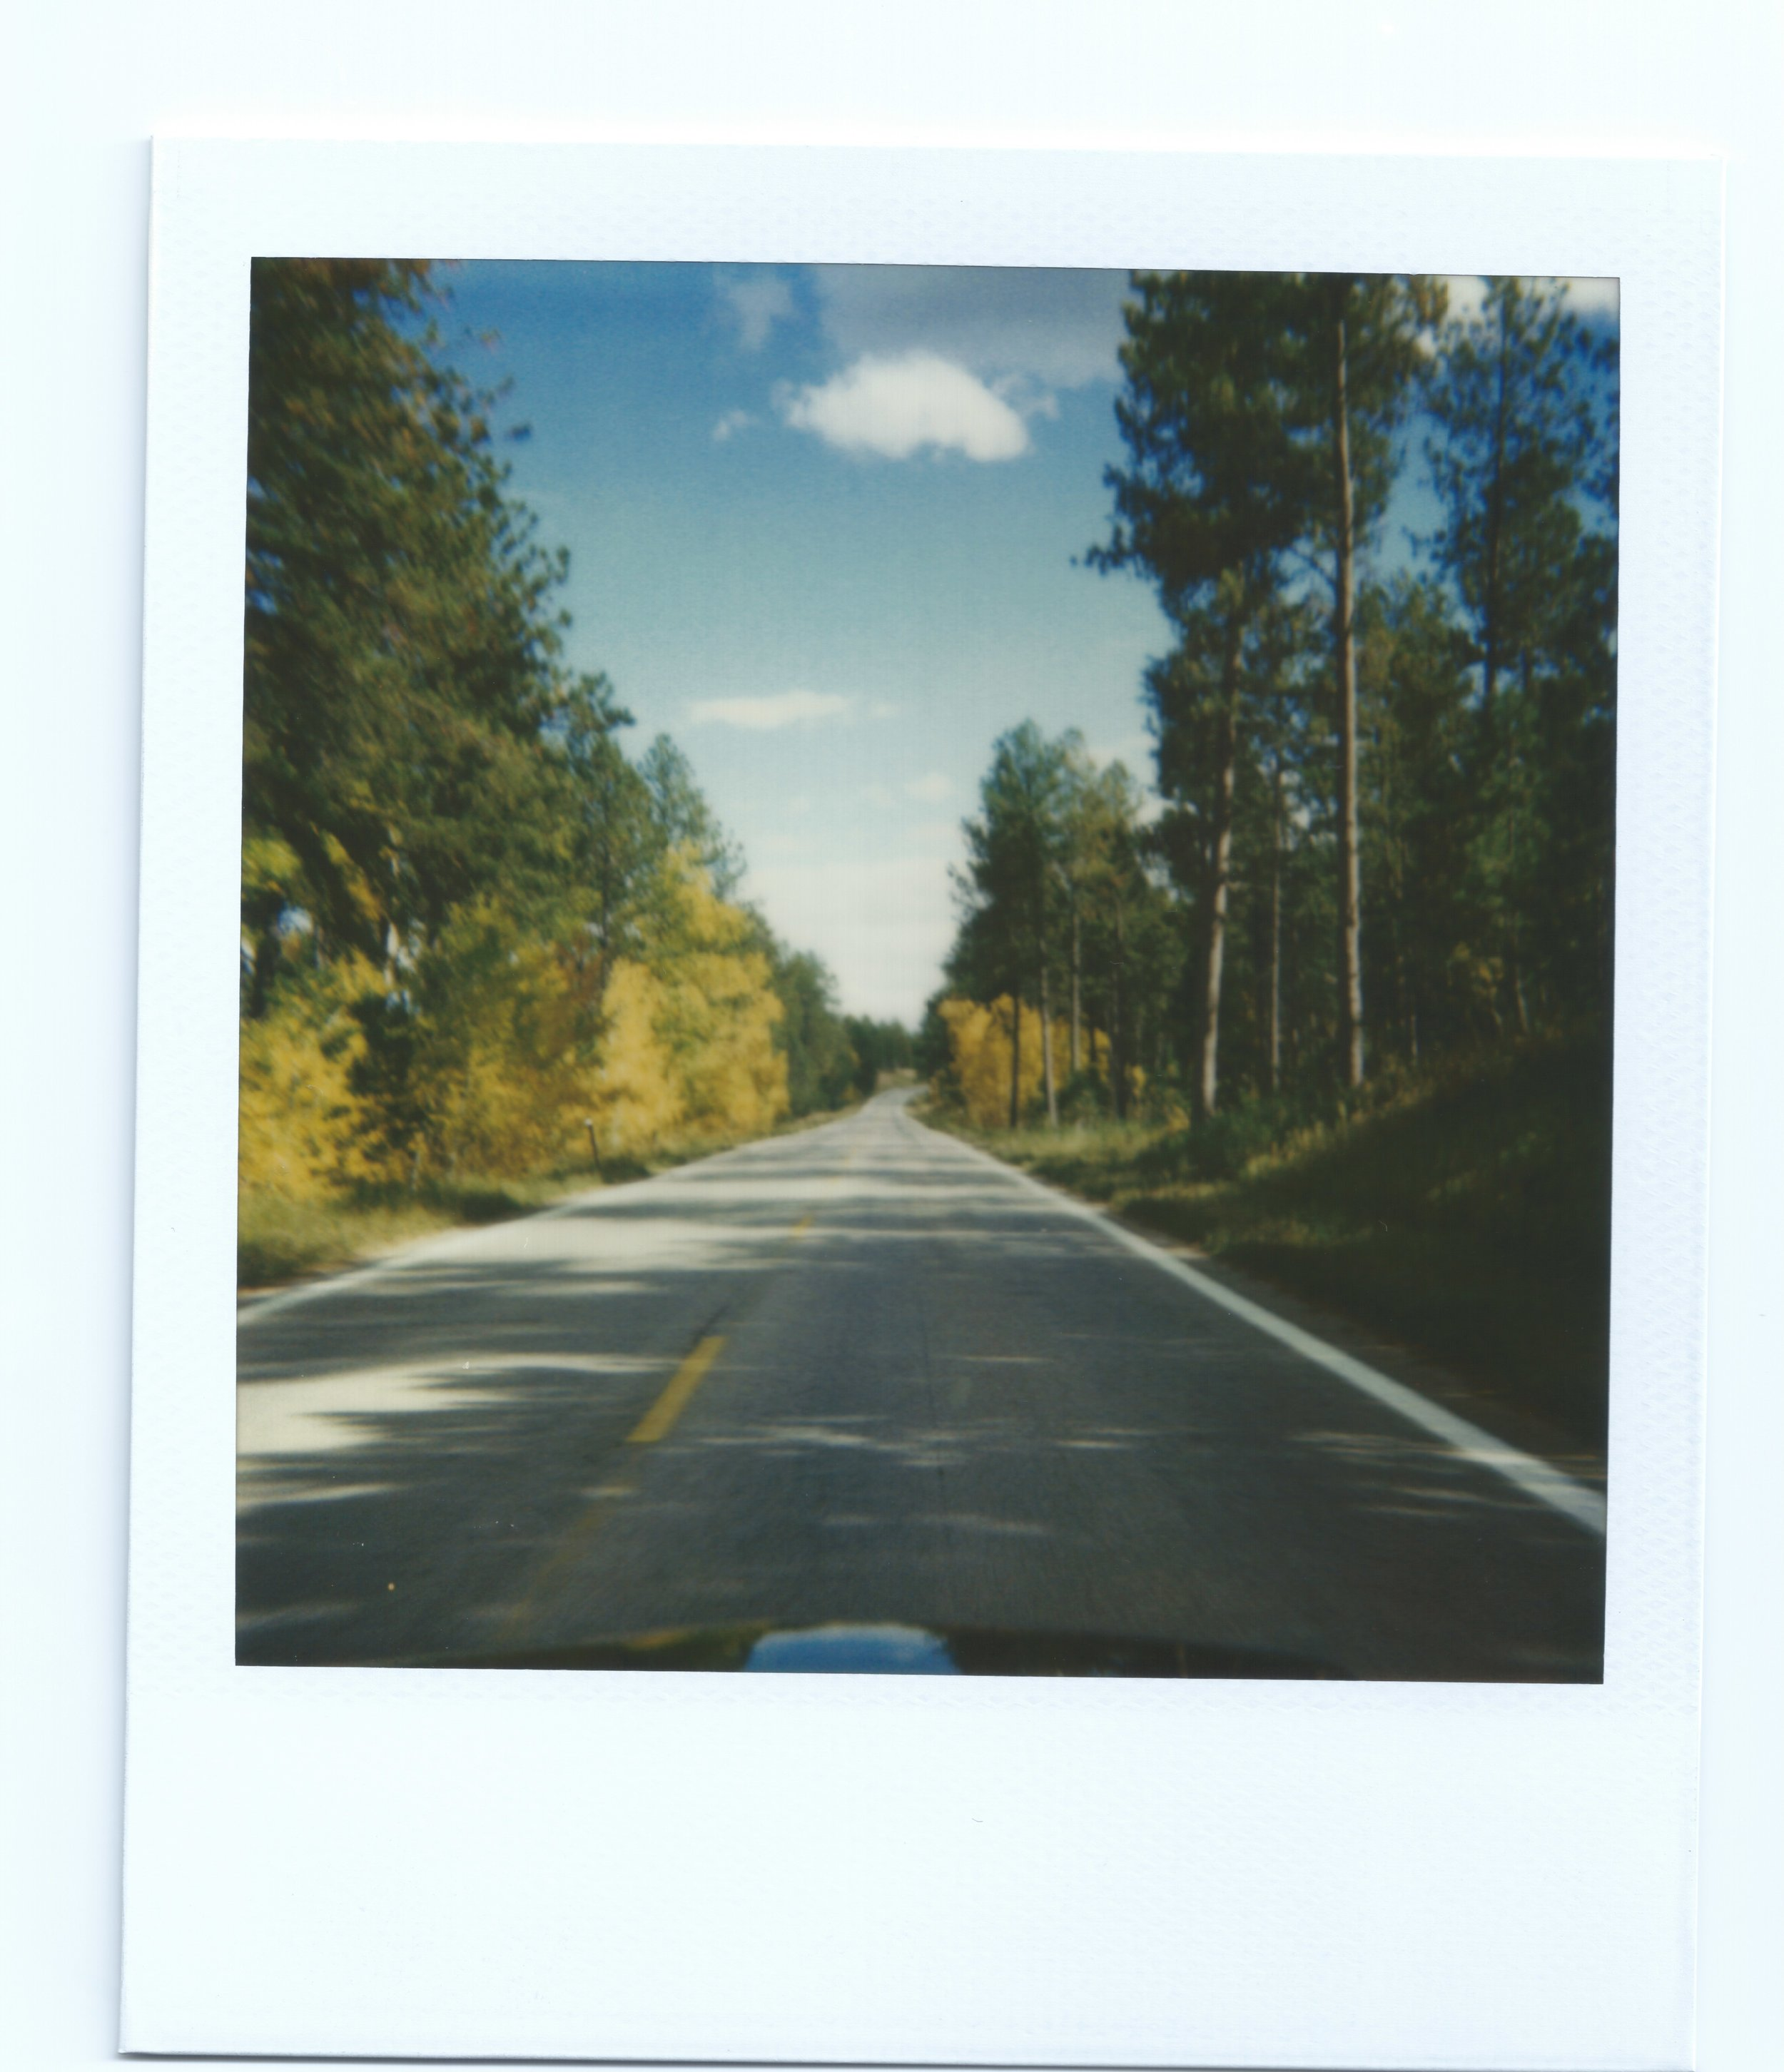 Road_8_fallcolor_binder3.jpeg